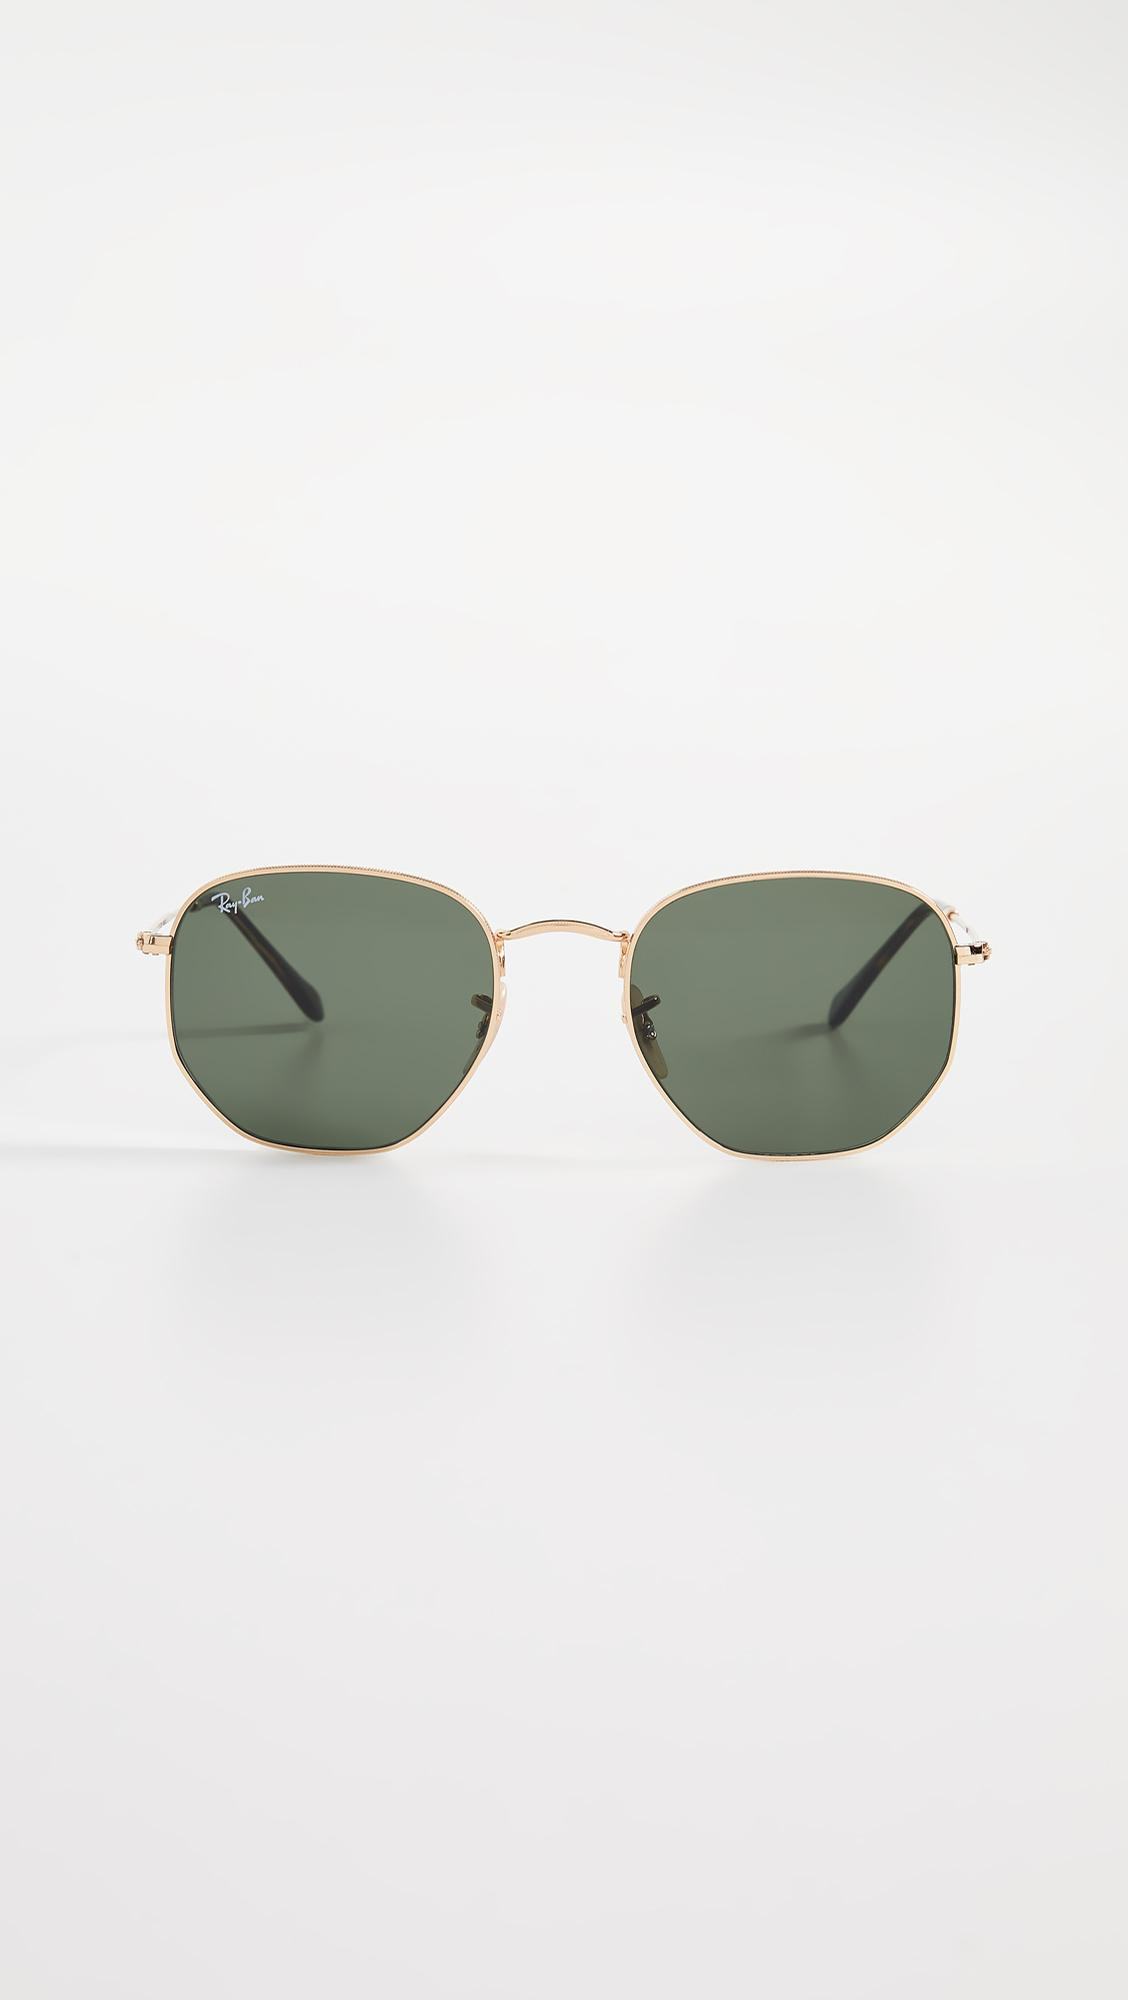 d483acd169f Ray-Ban Rb3548n Hexagonal Sunglasses in Green - Lyst